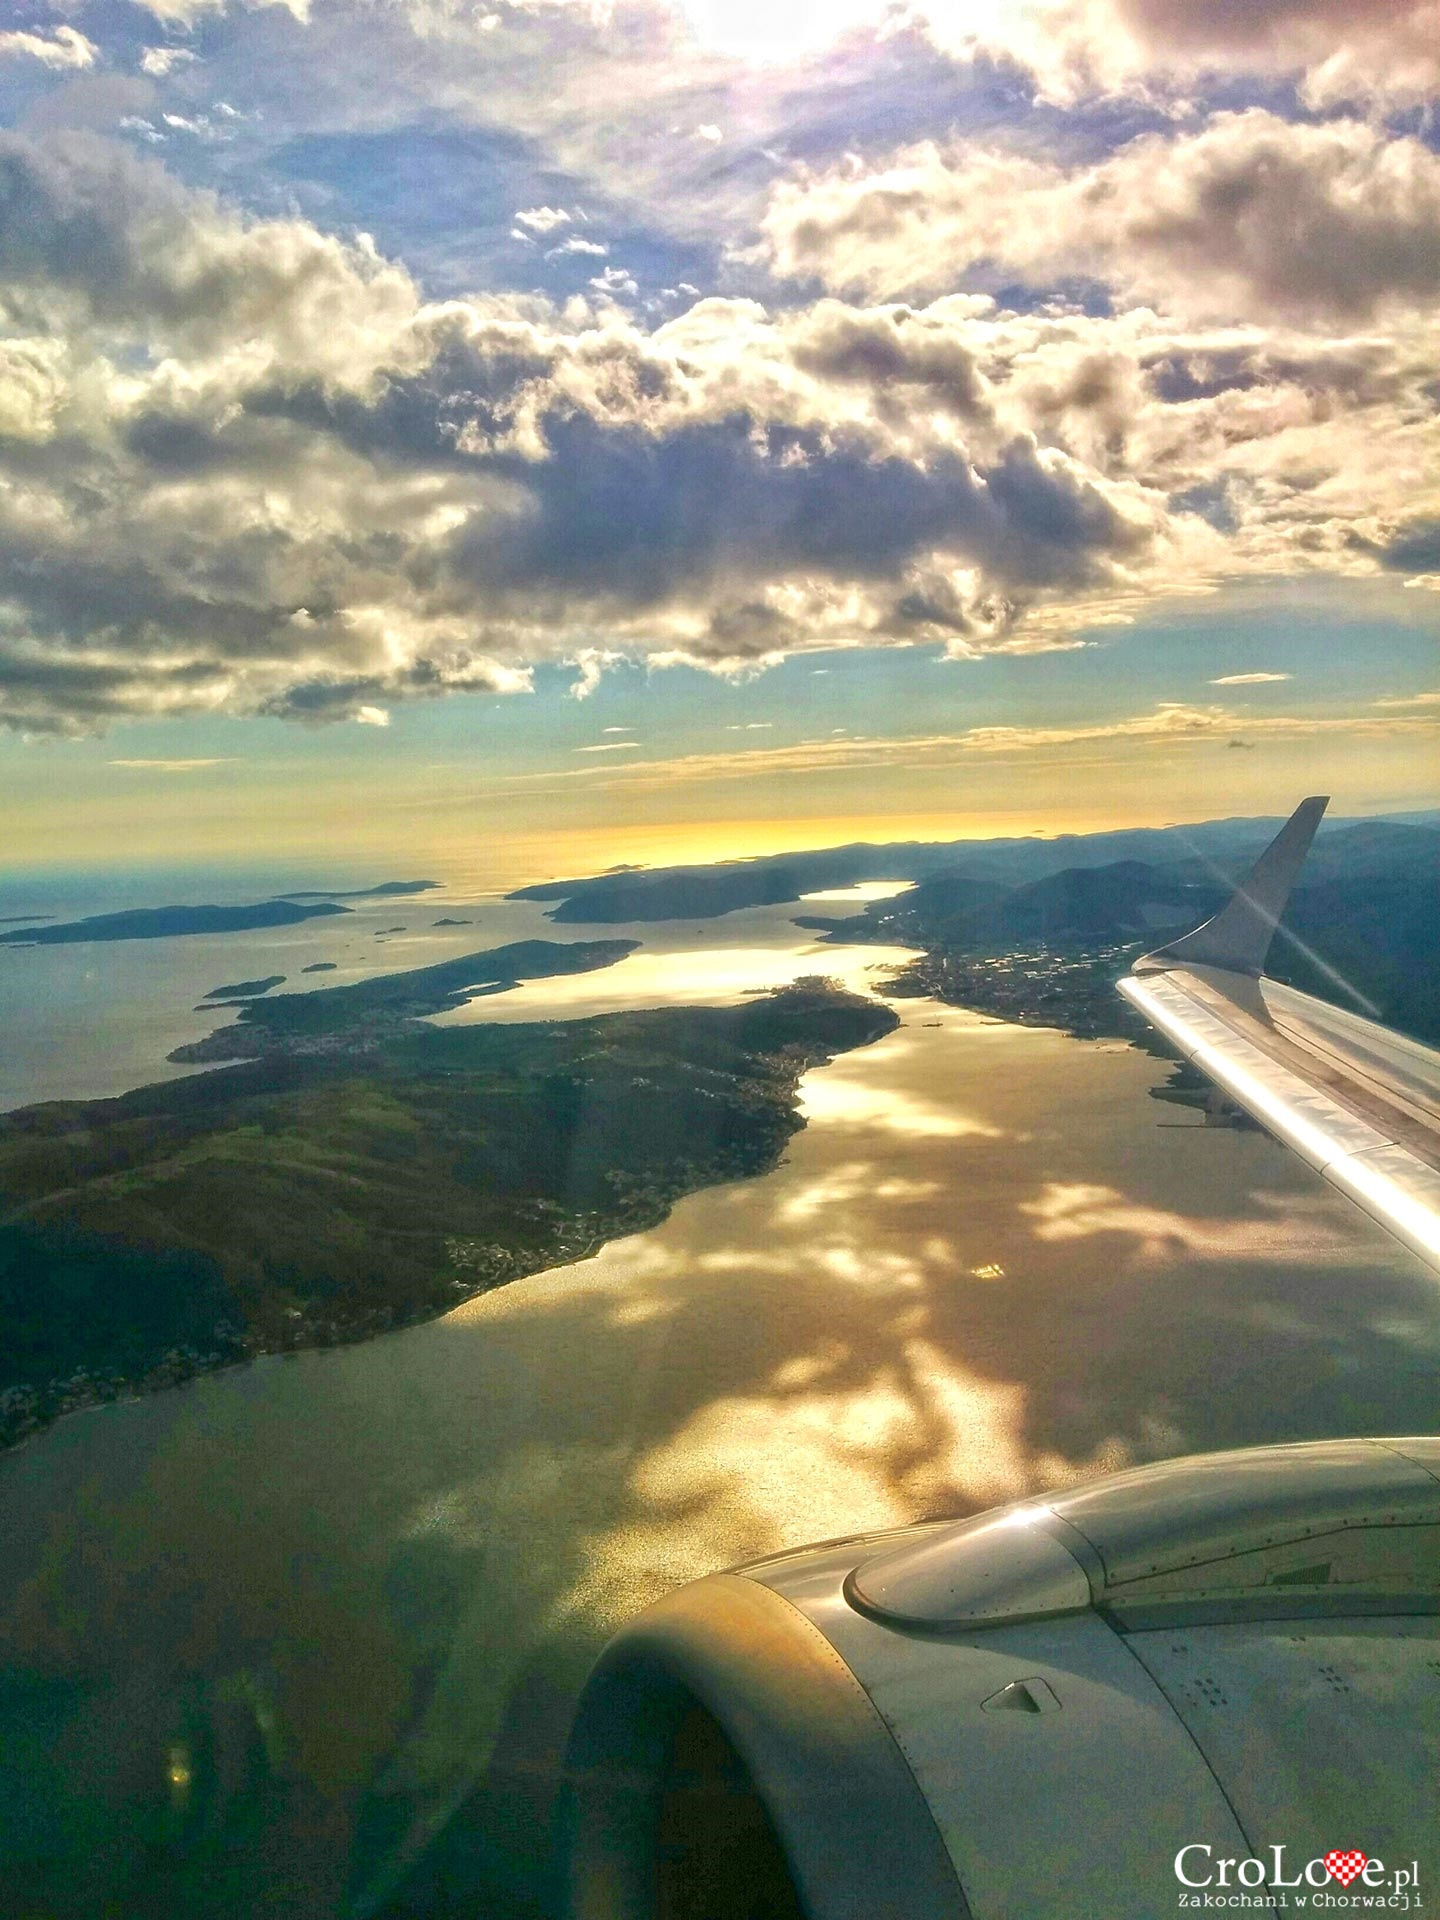 Widok z samolotu na wyspę Čiovo